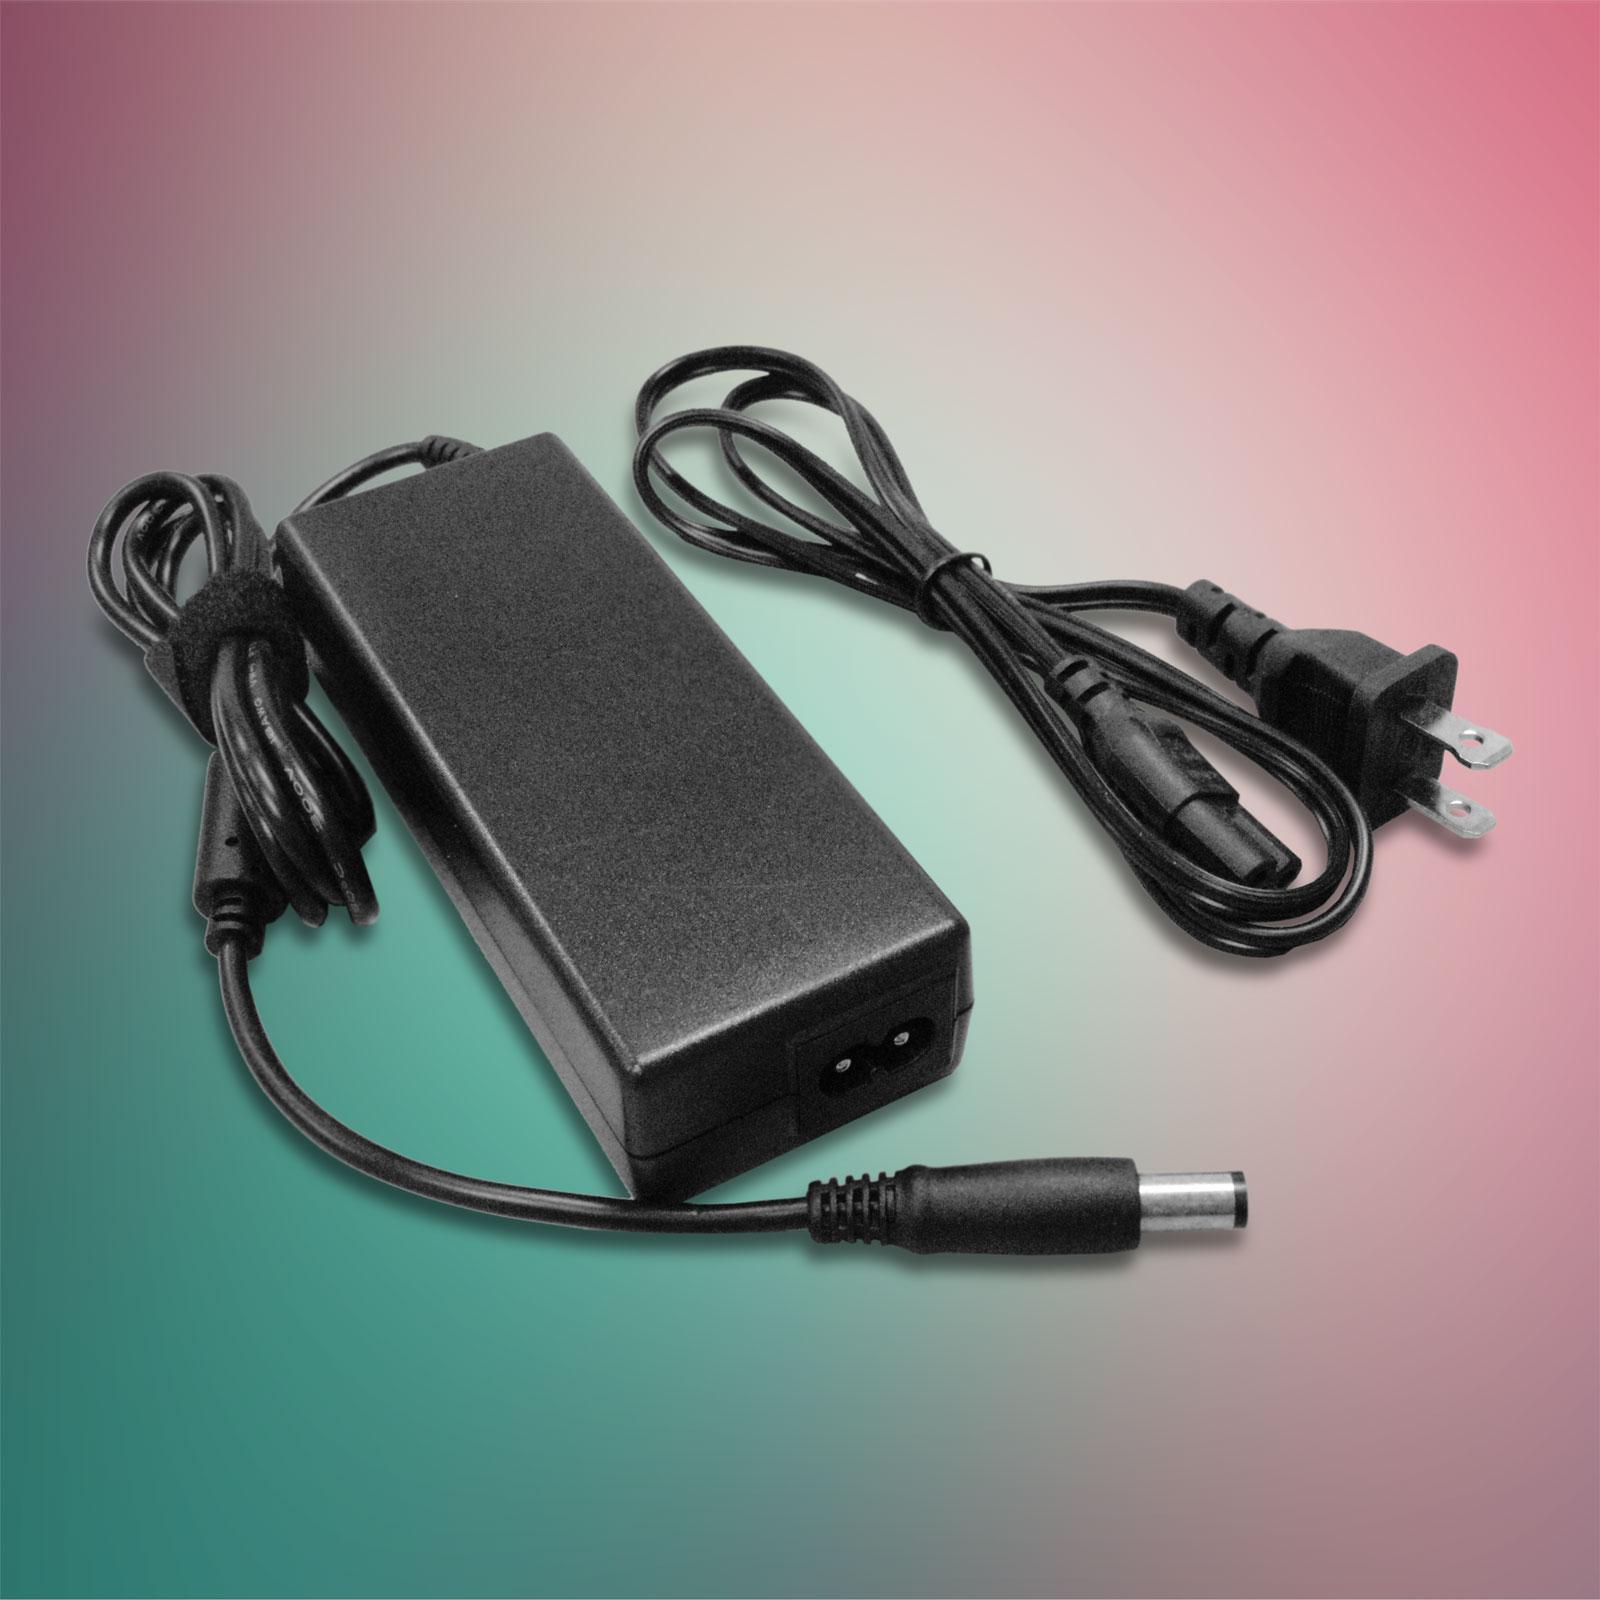 B N Adapter 6v Dell Adapter Usb Type C To Hdmi Vga Ethernet Usb 3 0 Da200 V Brake Disc Adapter Adaptor Vga Hdmi Media Galaxy: AC Adapter For Dell ADP-90AH-B C8023 LA90P LA90PSO P-10